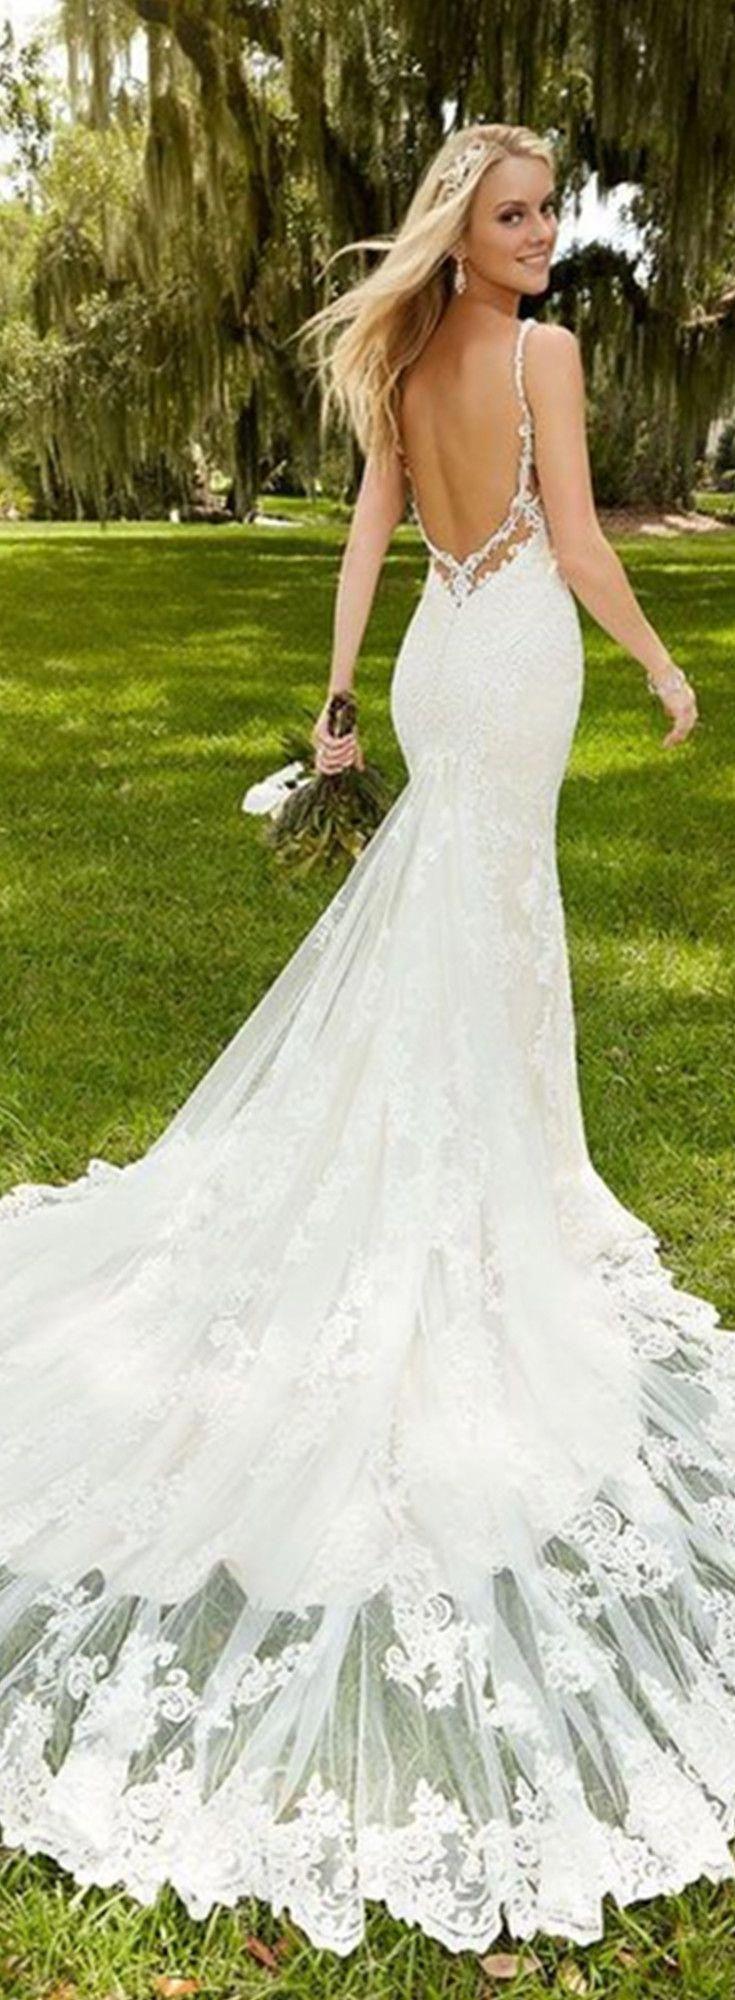 SPAGHETTI STRAPS LONG TAIL SEXY LOW BACK MERMAID LACE WEDDING DRESS #beachweddingdresses